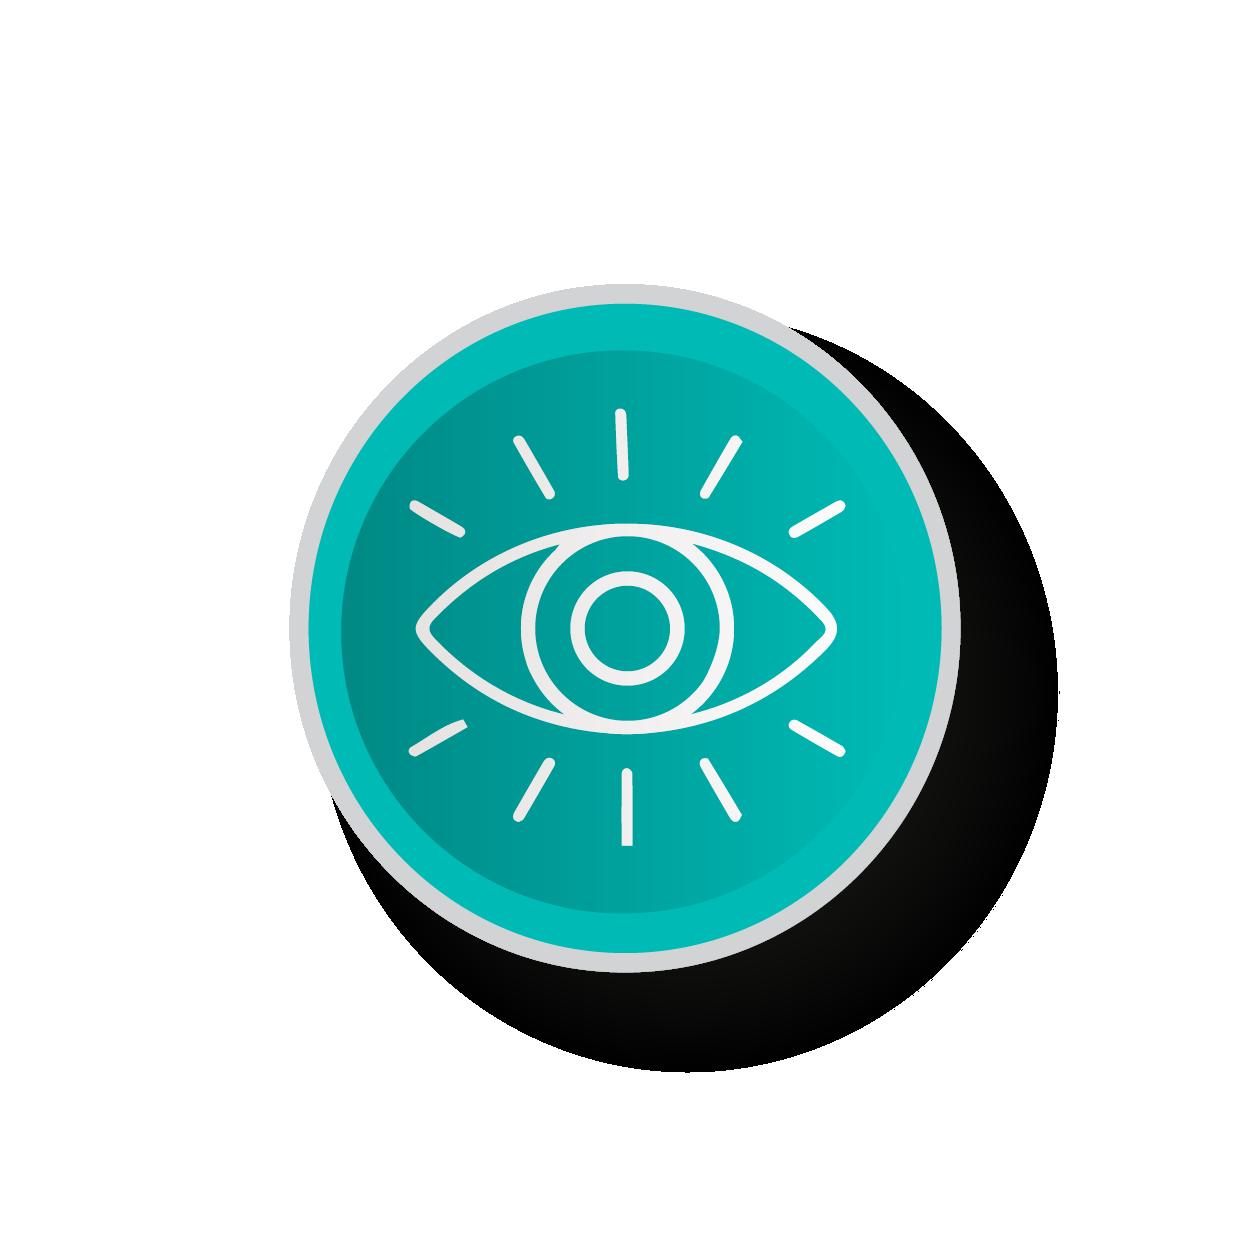 mision vision valores-19